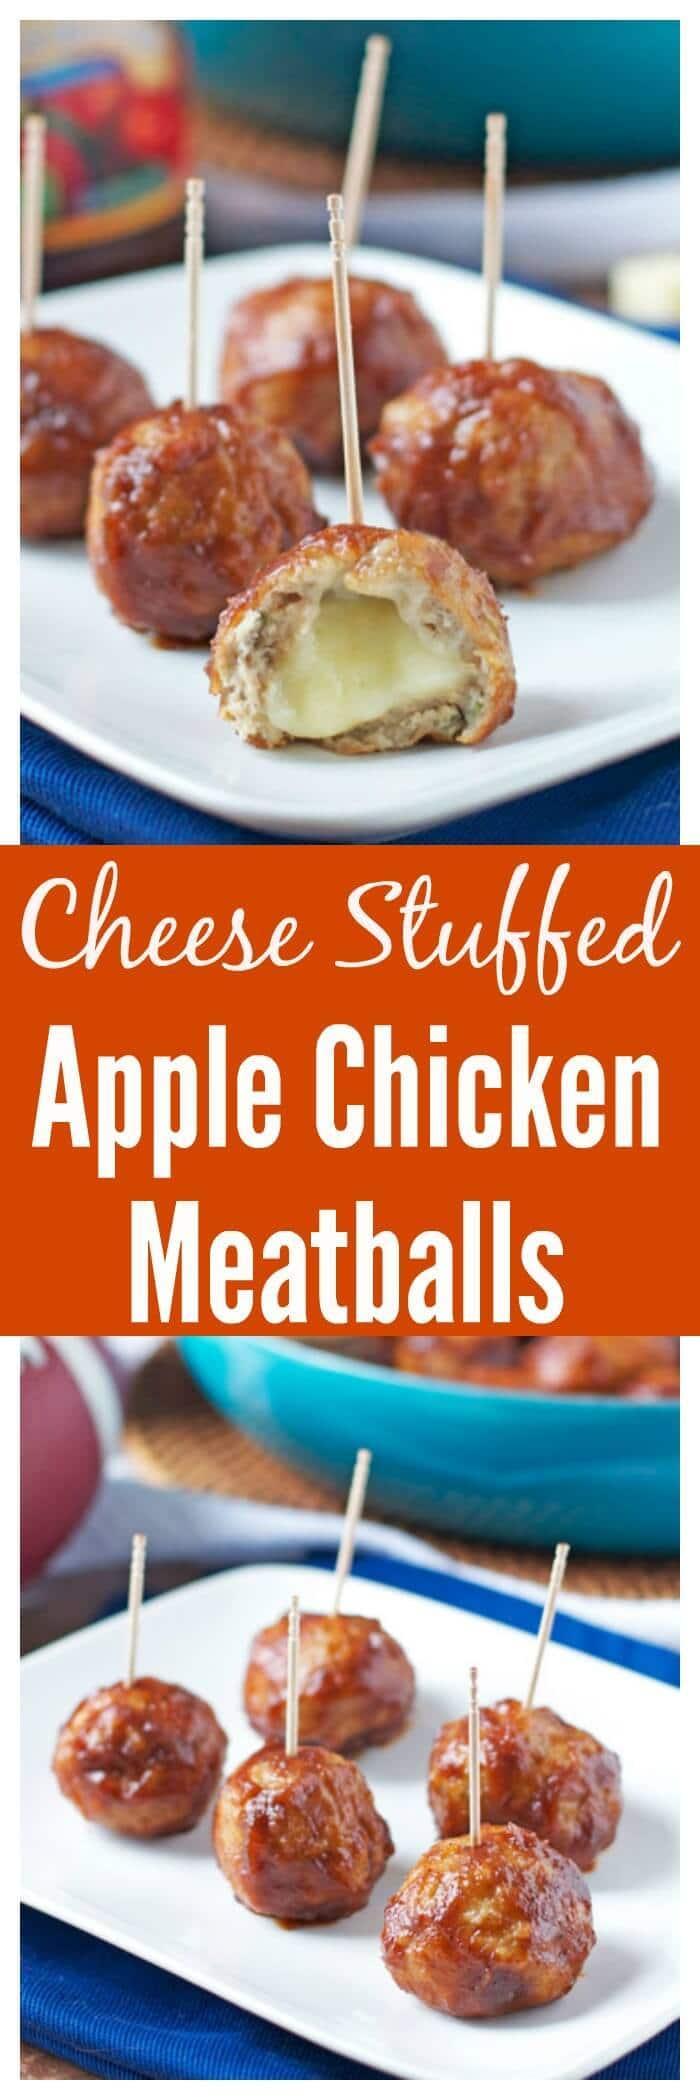 Cheese Stuffed Apple Chicken Meatballs